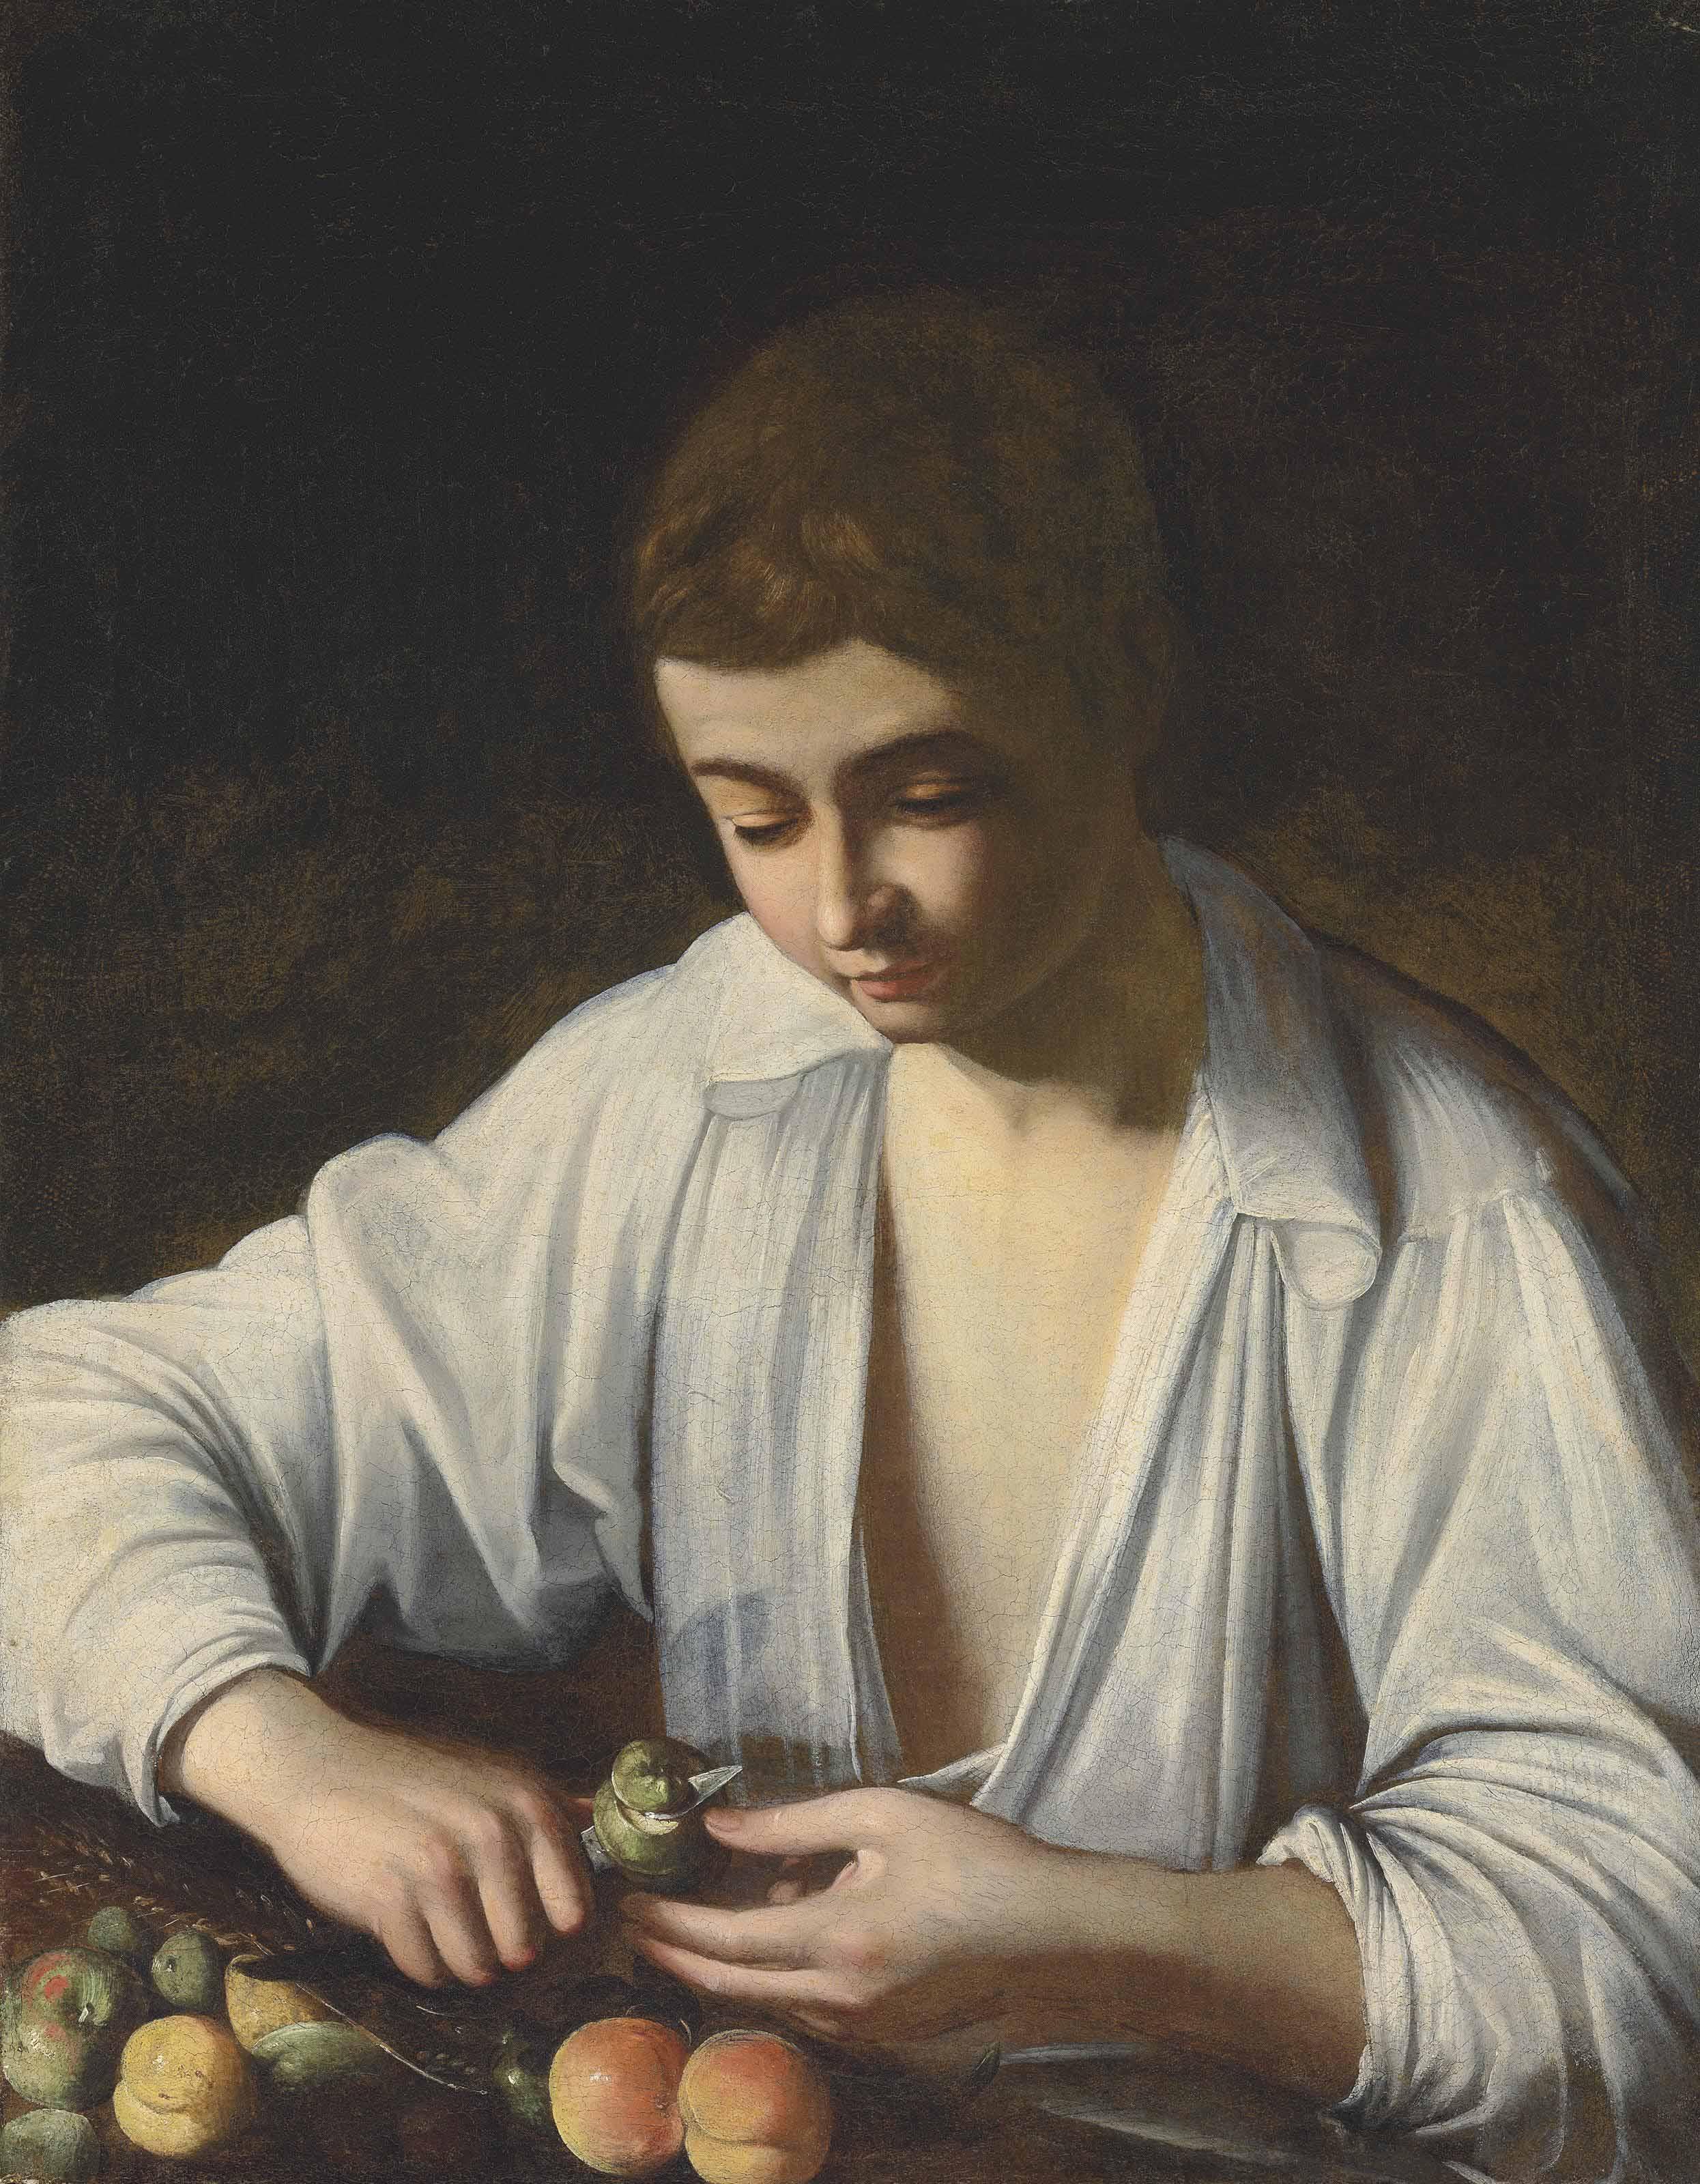 Associate of Michelangelo Meri